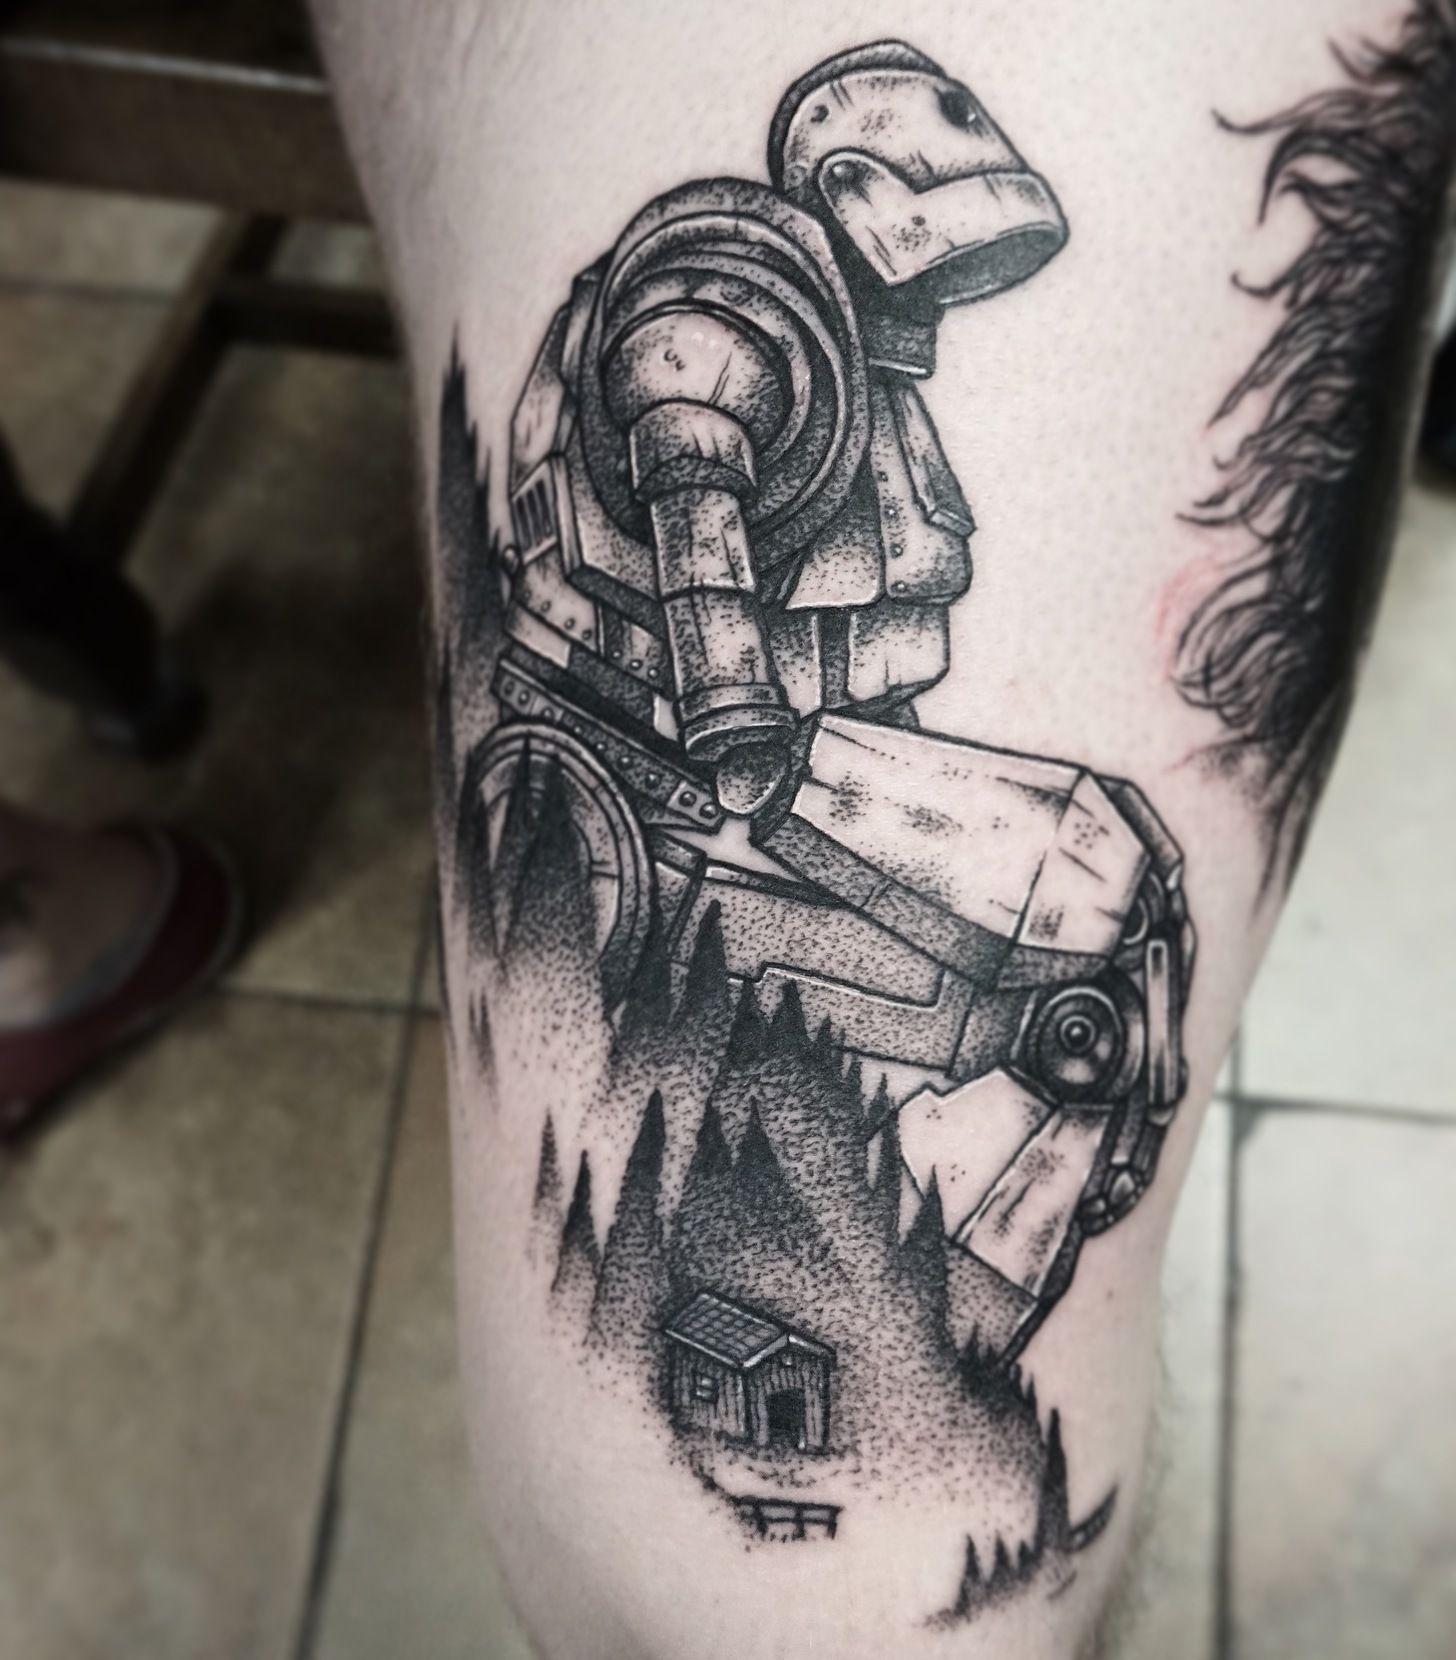 Flaming art tattoo for geek tattoo lovers this kind of batman - Iron Giant Tattoo